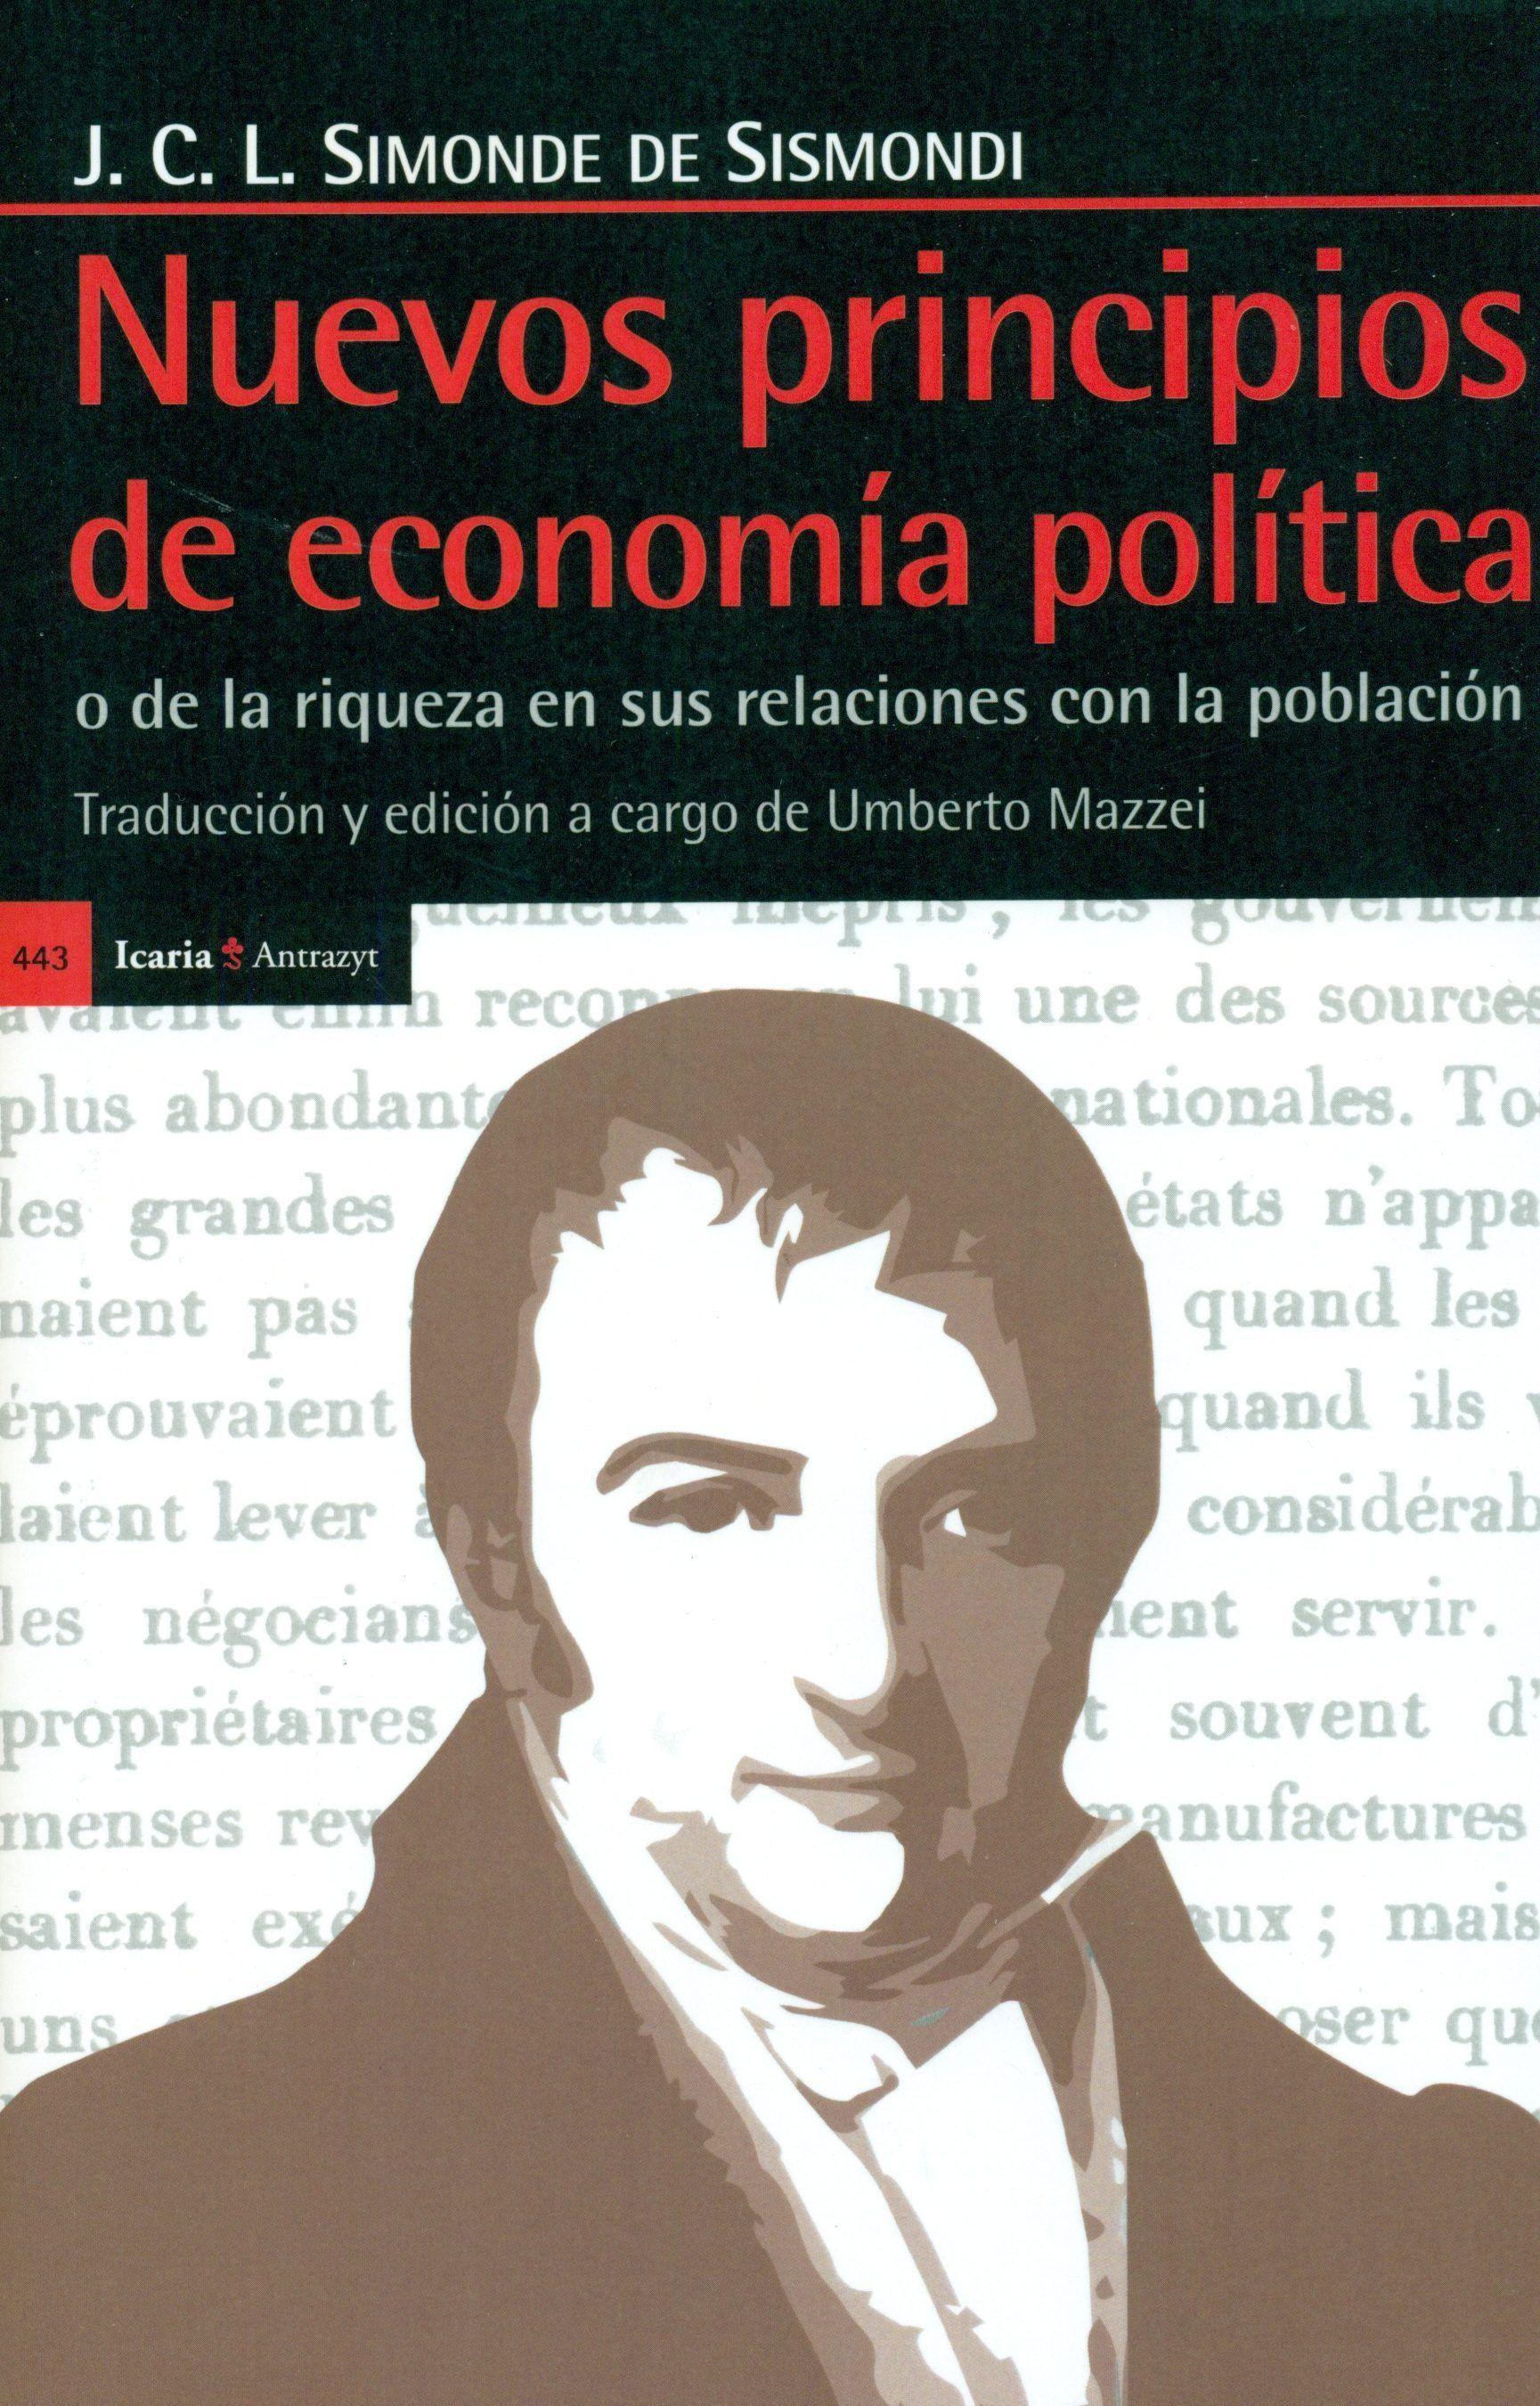 Nuevos Principios De Economia Politica Jean Charles Simonde De Sismondi 9788498887167 Comprar E Economia Politica Principio De Economia Libros De Economia